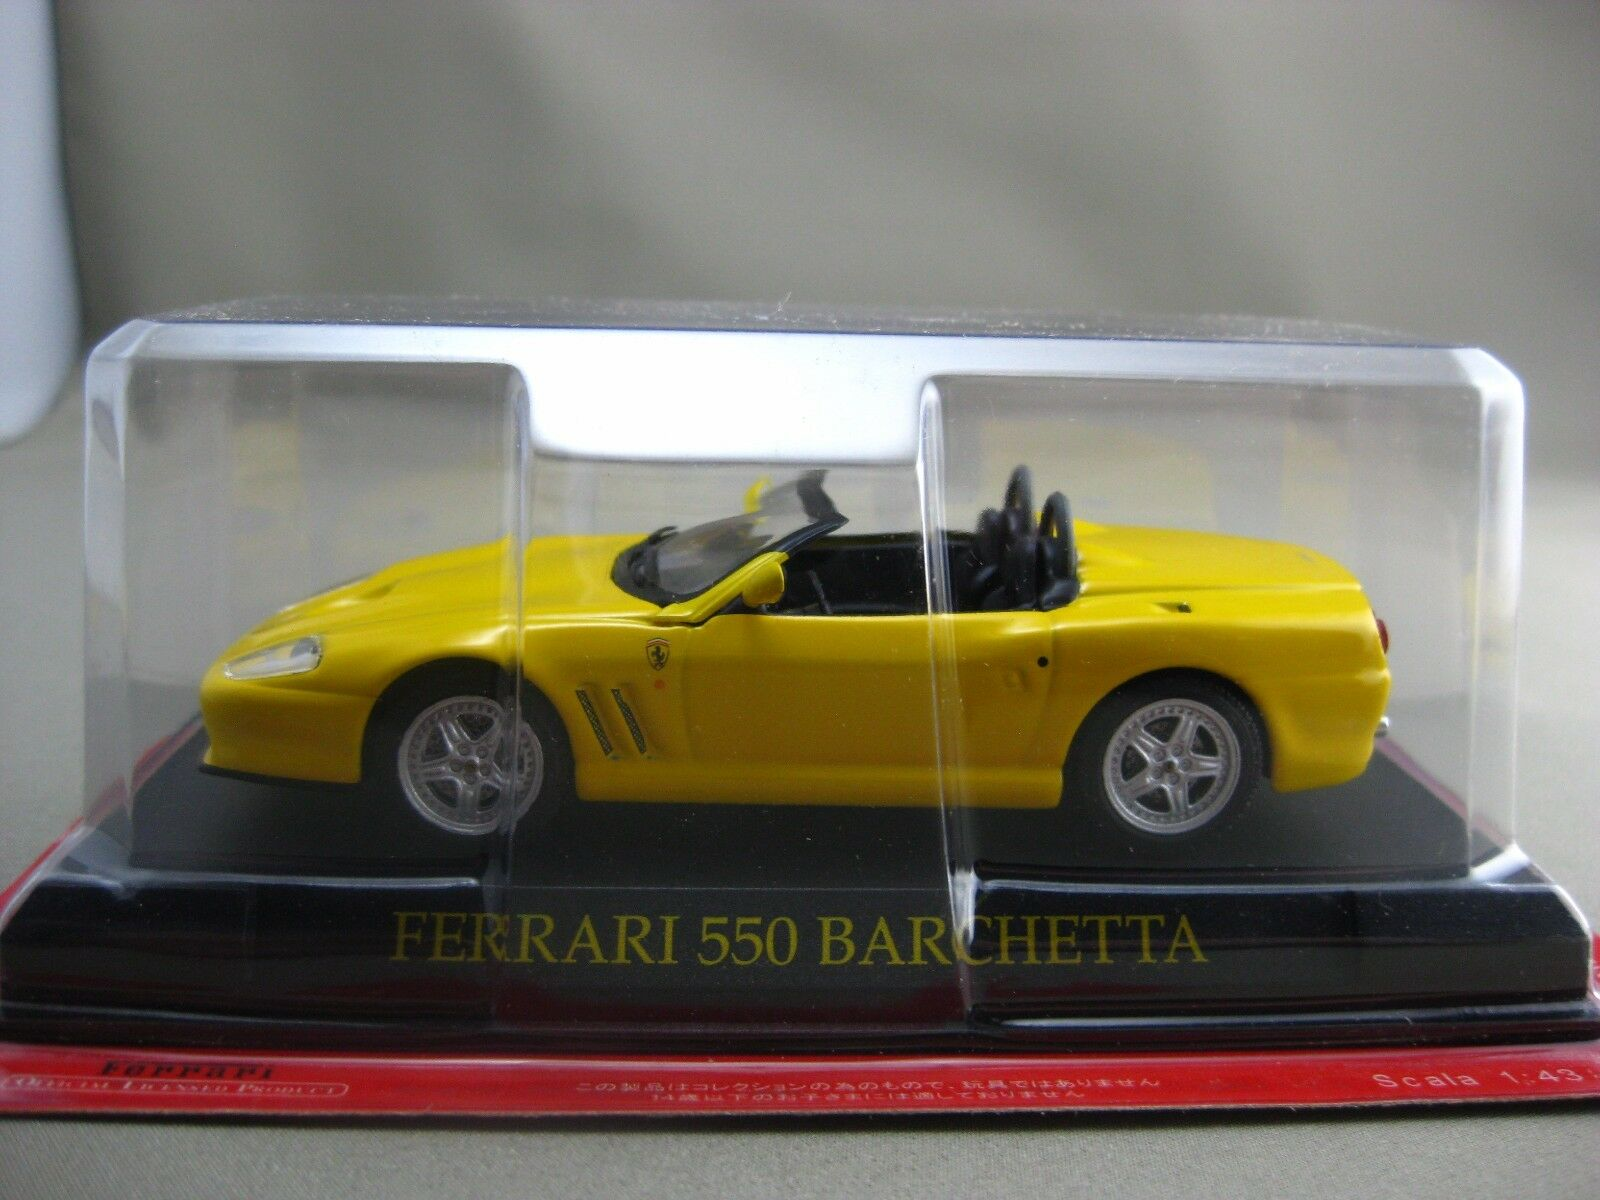 Ferrari 550 BARCHETTA hachette 1 43 Diecast car Vol.24